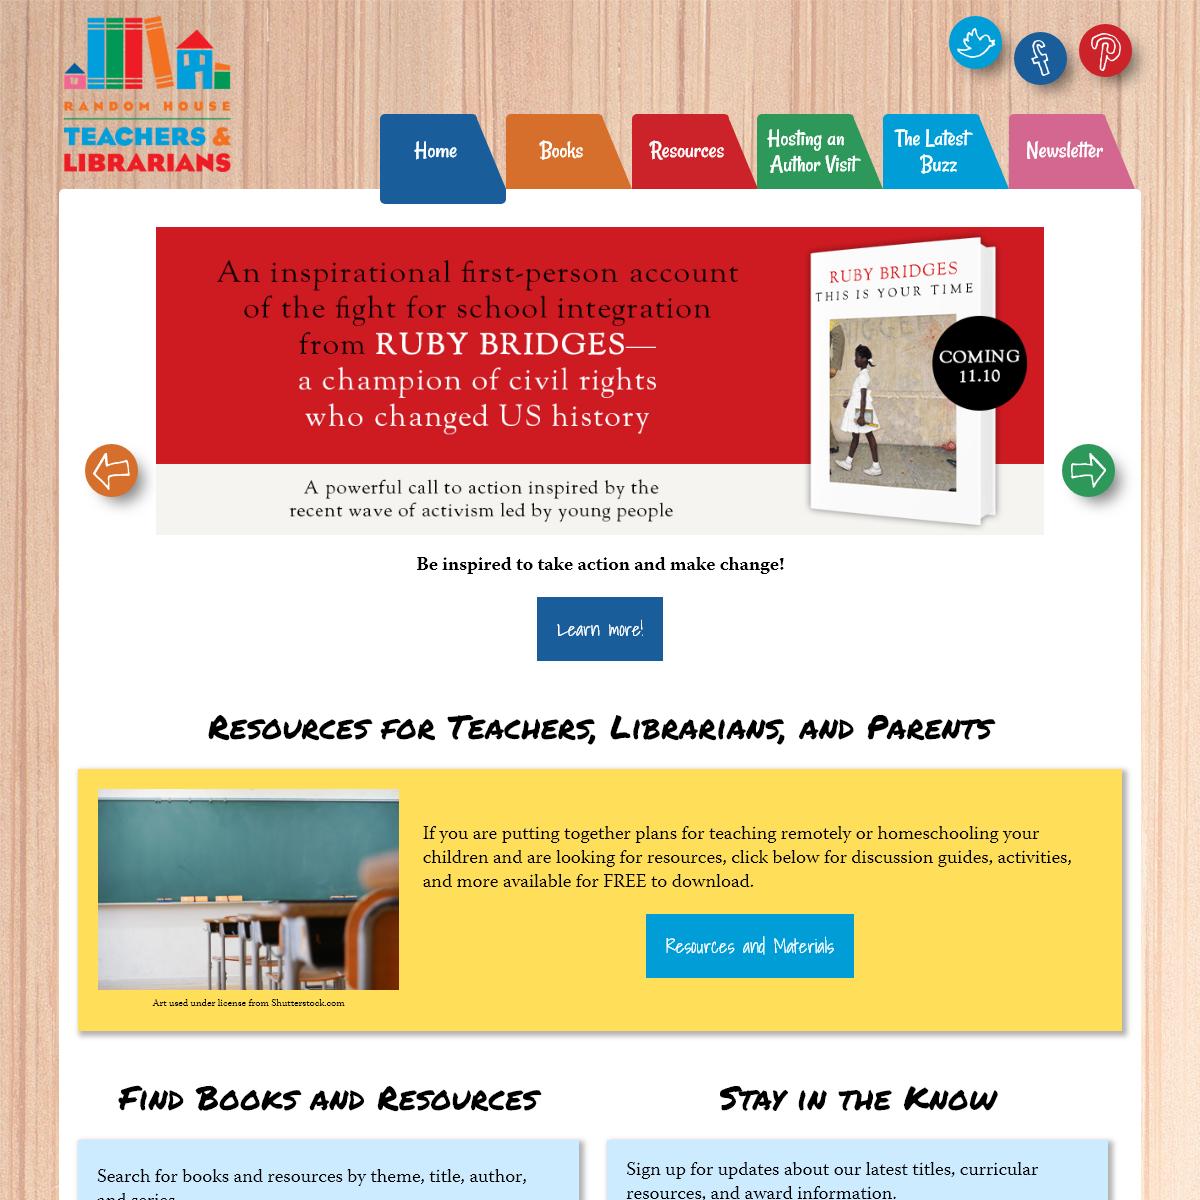 Random House Teachers and Librarians